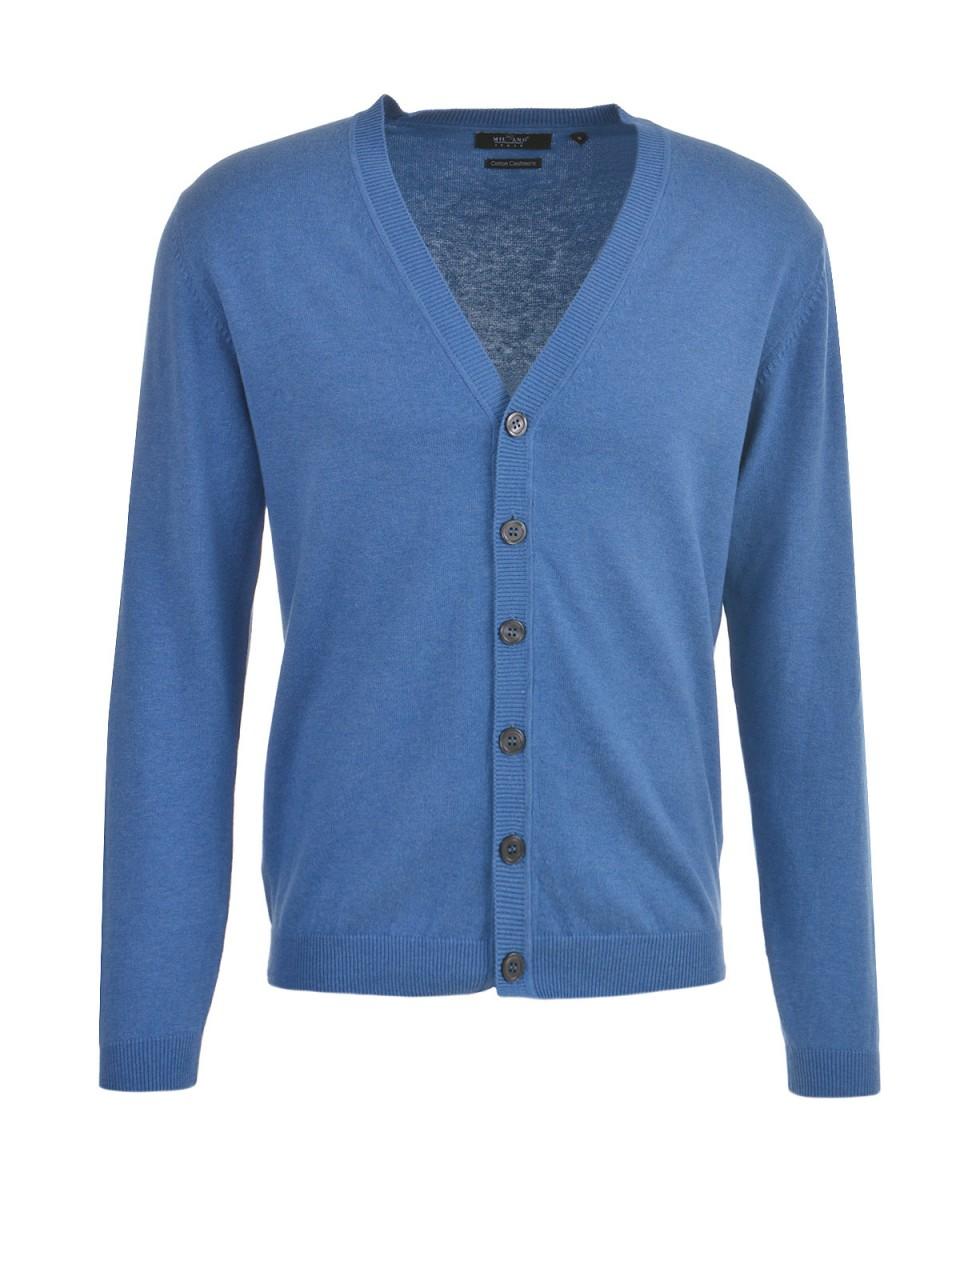 milano-italy-herren-strickjacke-blau